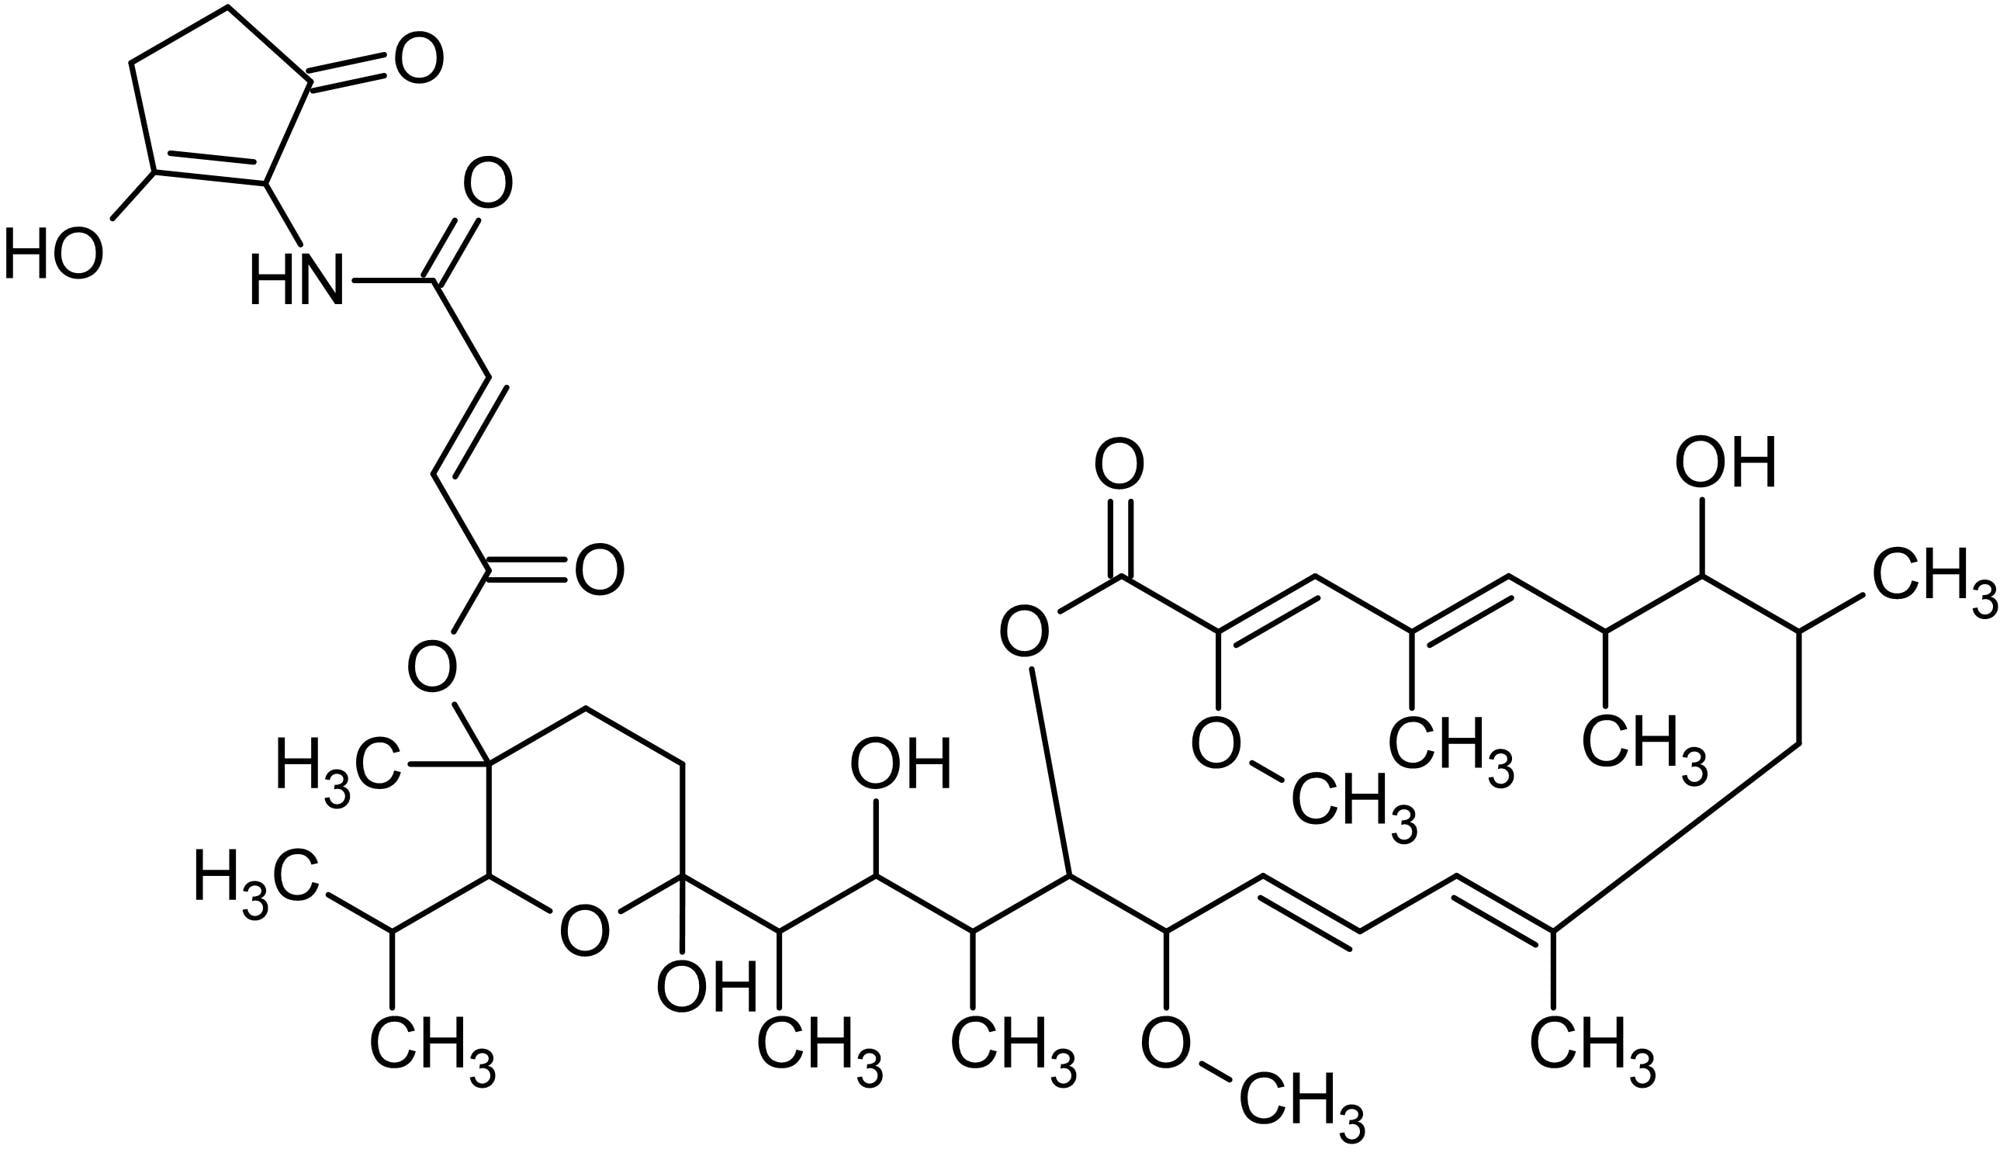 Chemical Structure - Bafilomycin B1, macrolide antibiotic (ab143365)